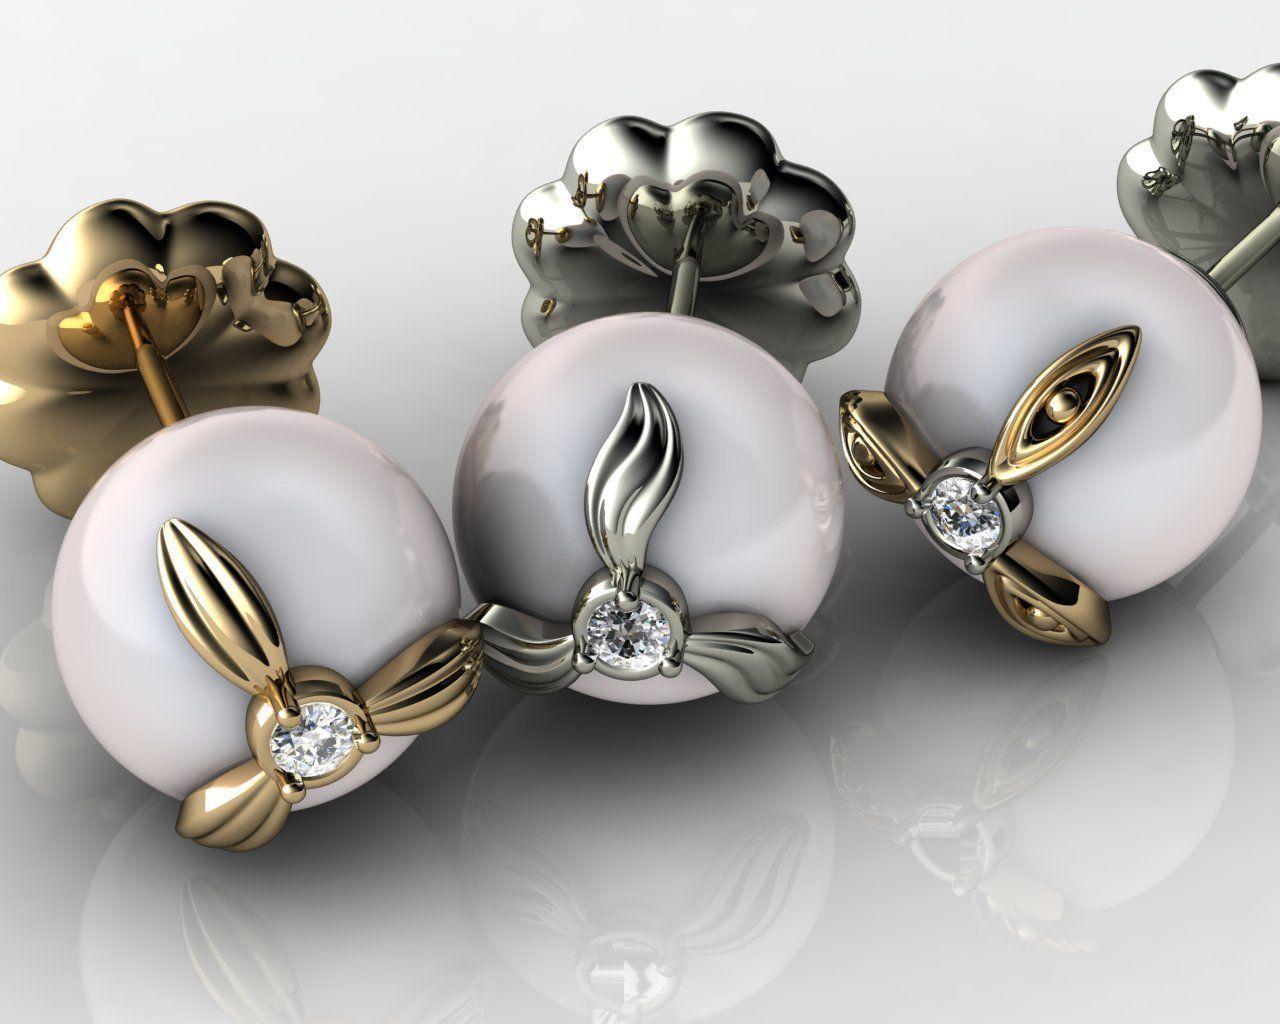 diamond earrings model - photo #40